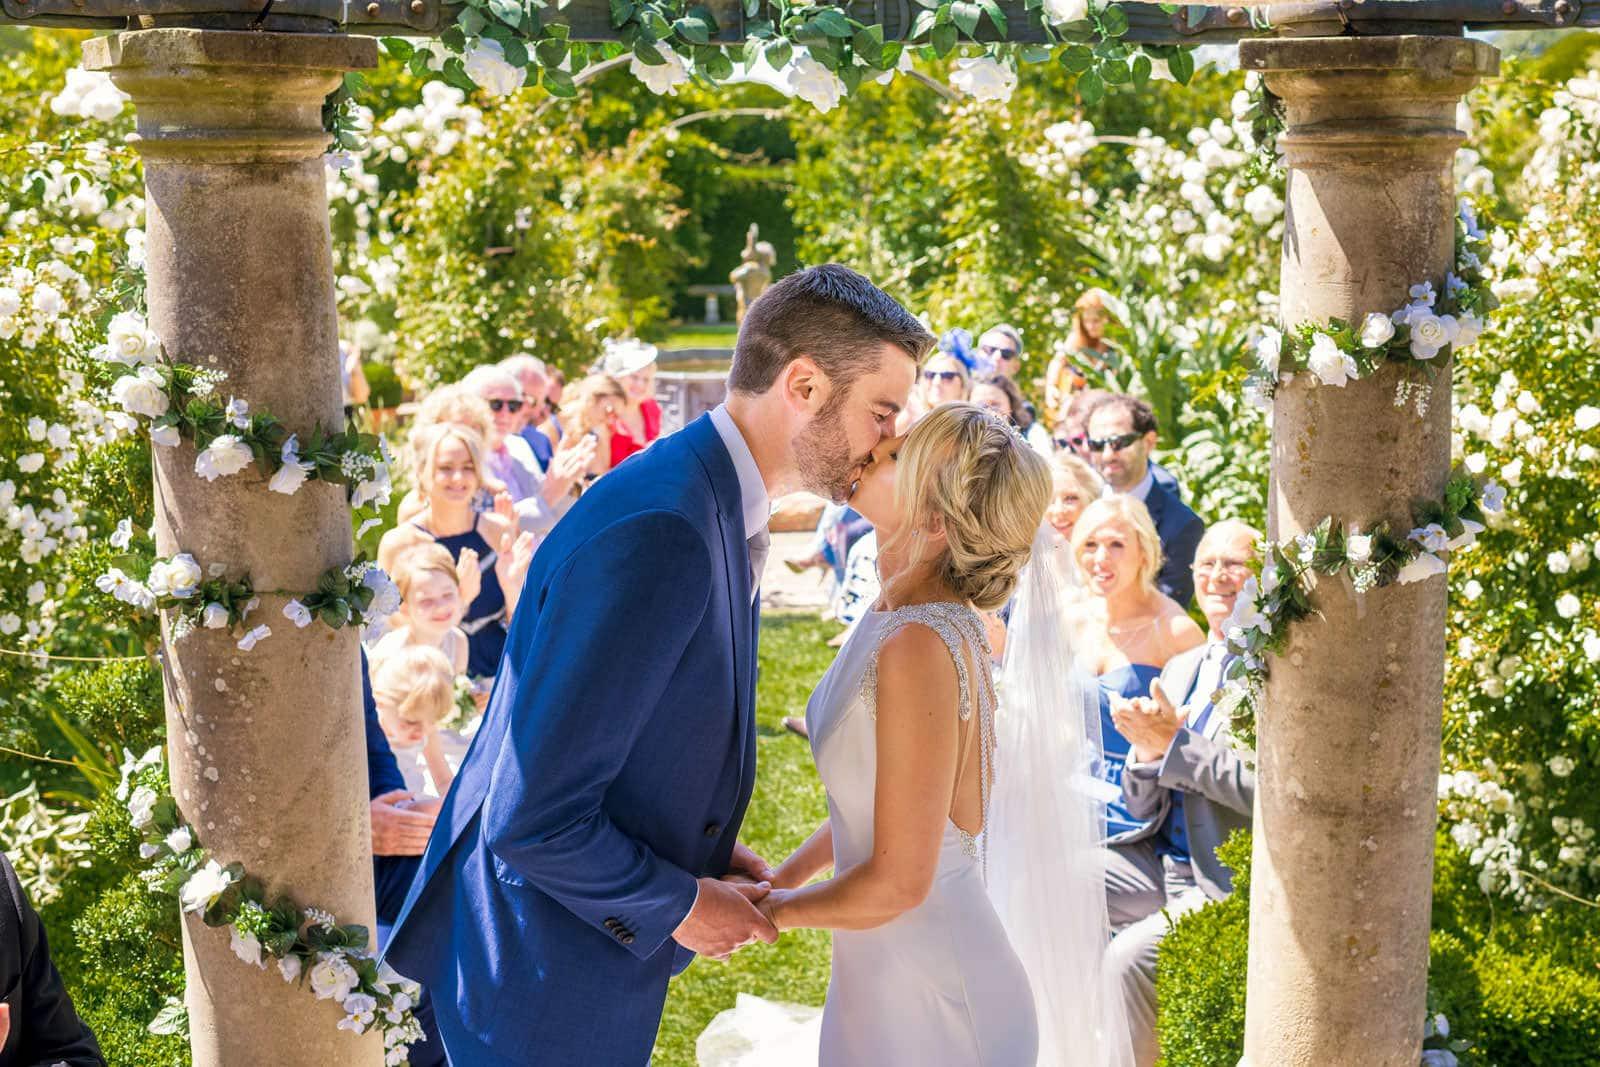 Wedding photographer Birtsmorton Court